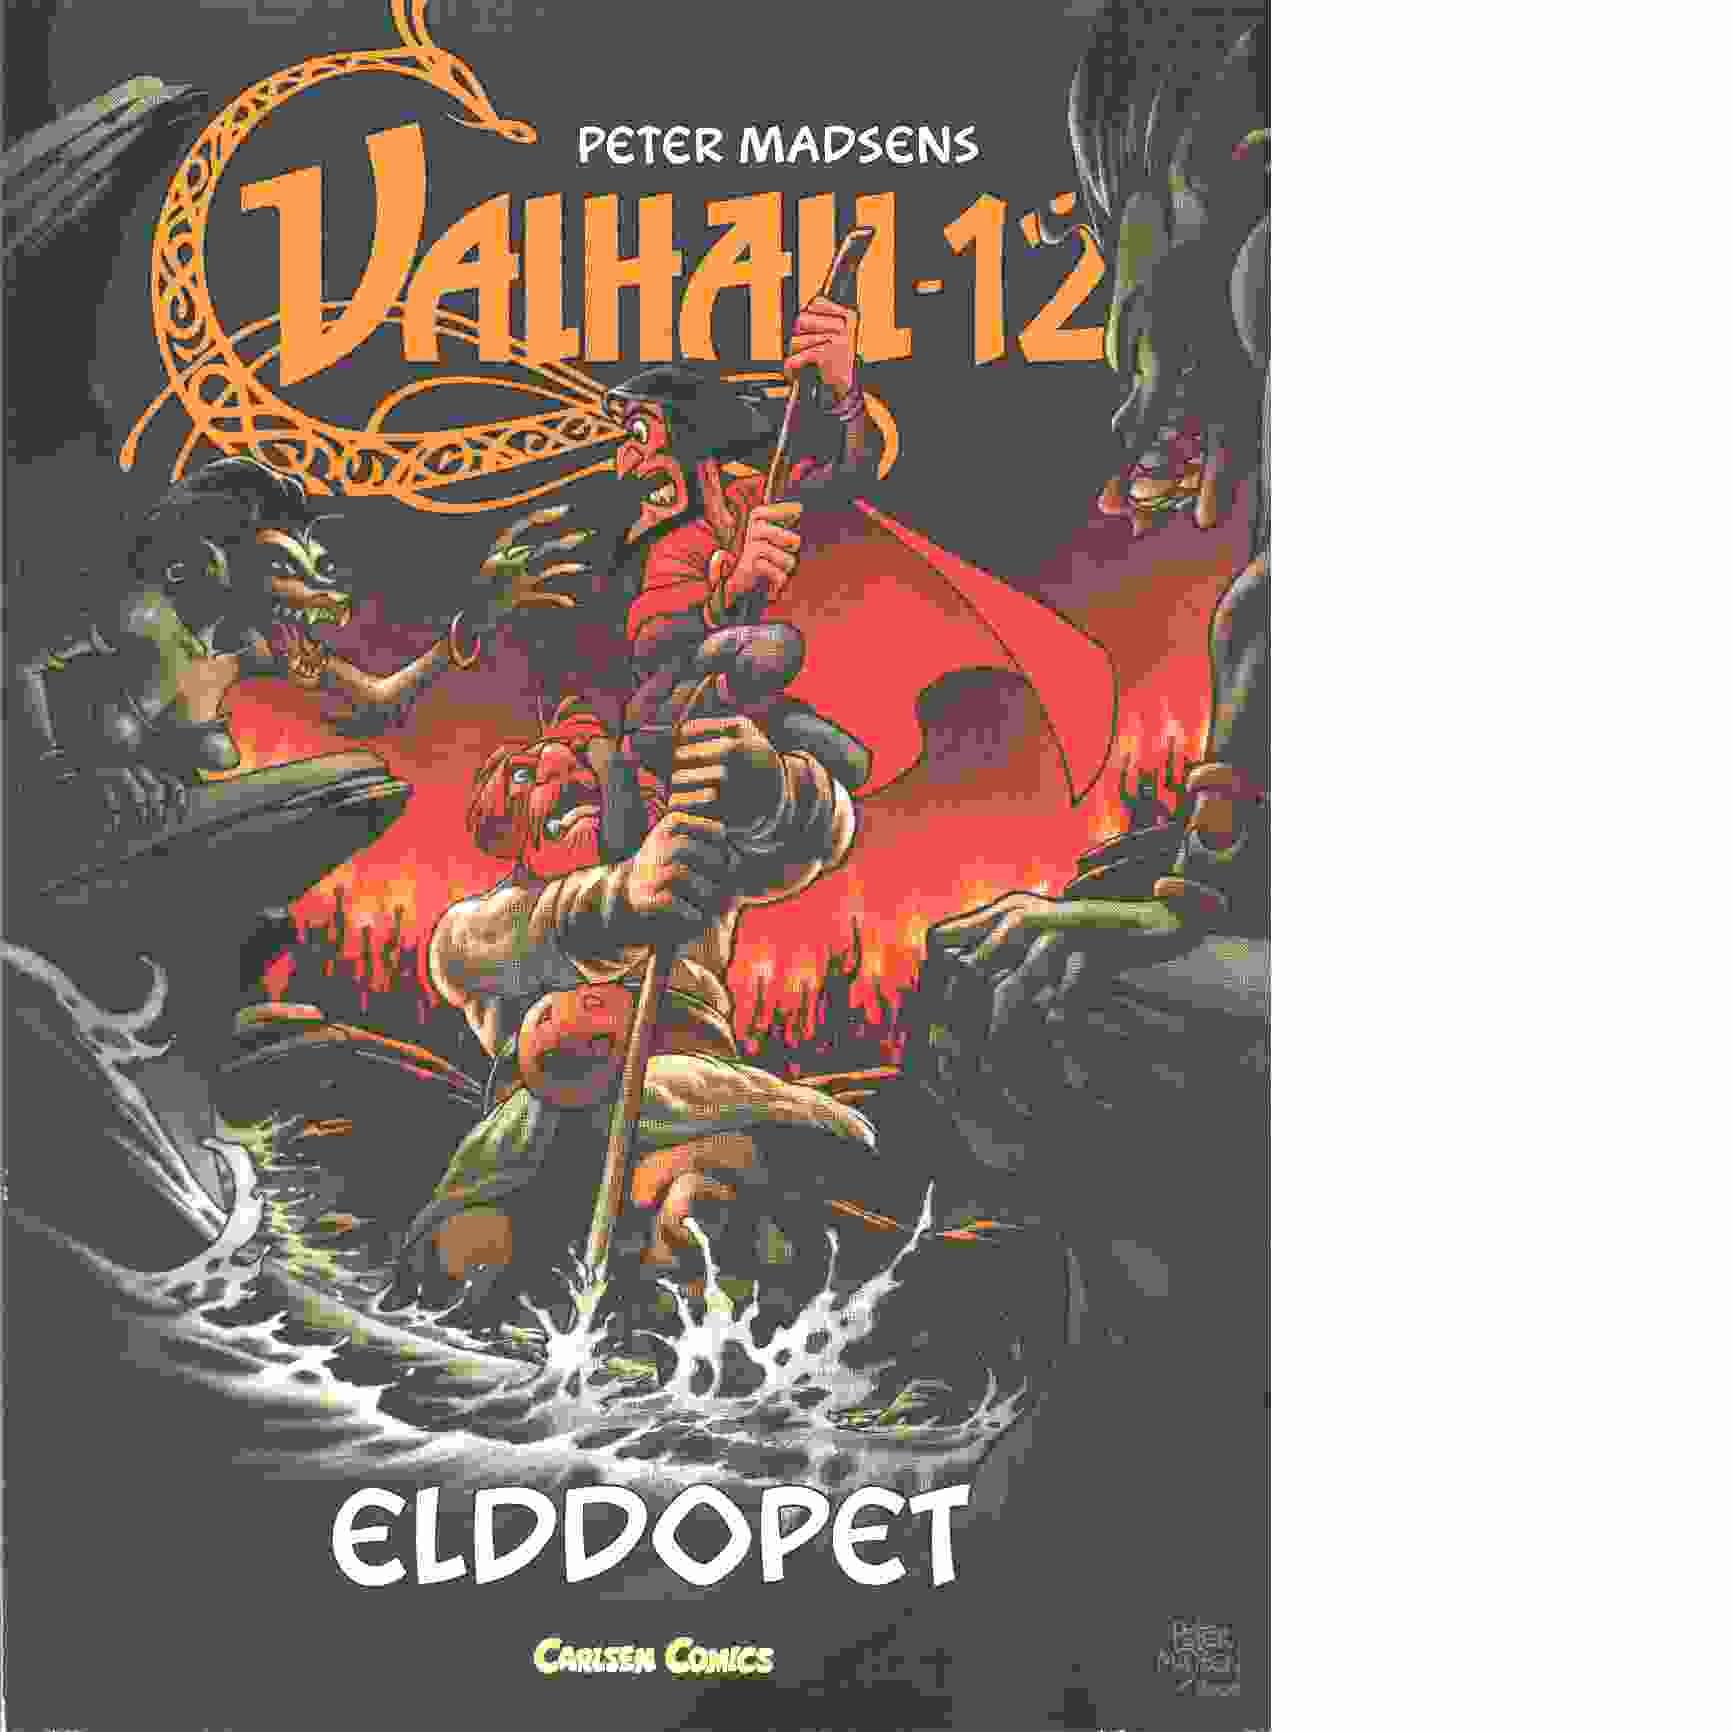 Valhall 12 : Elddopet - Madsen, Peter  och Kure, Henning